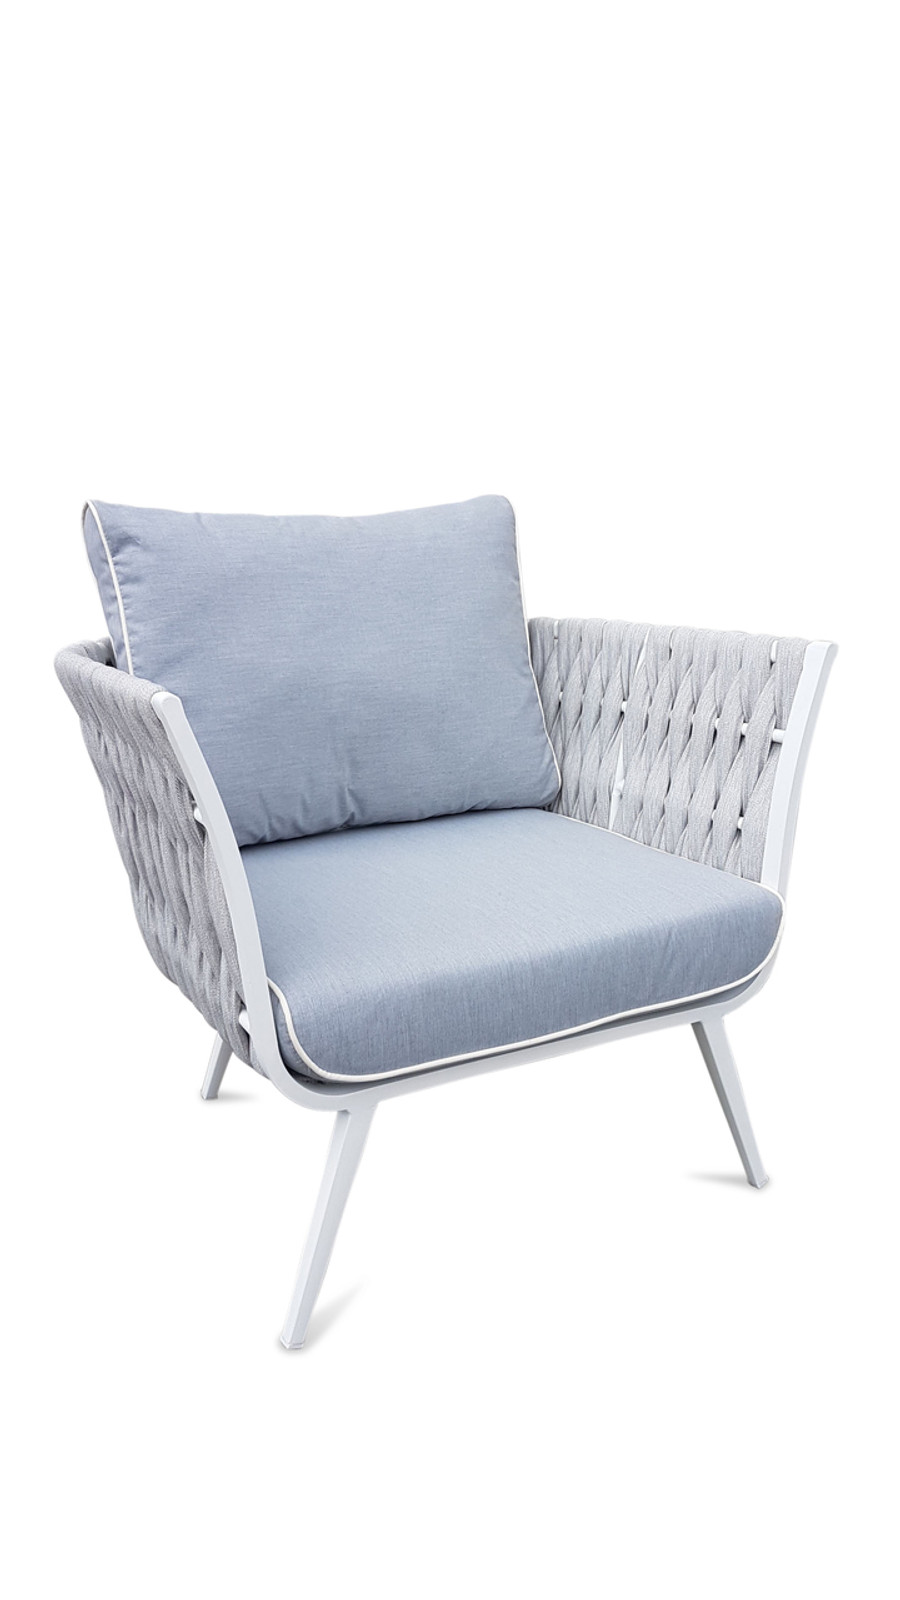 Zen outdoor strap and aluminium lounge chair